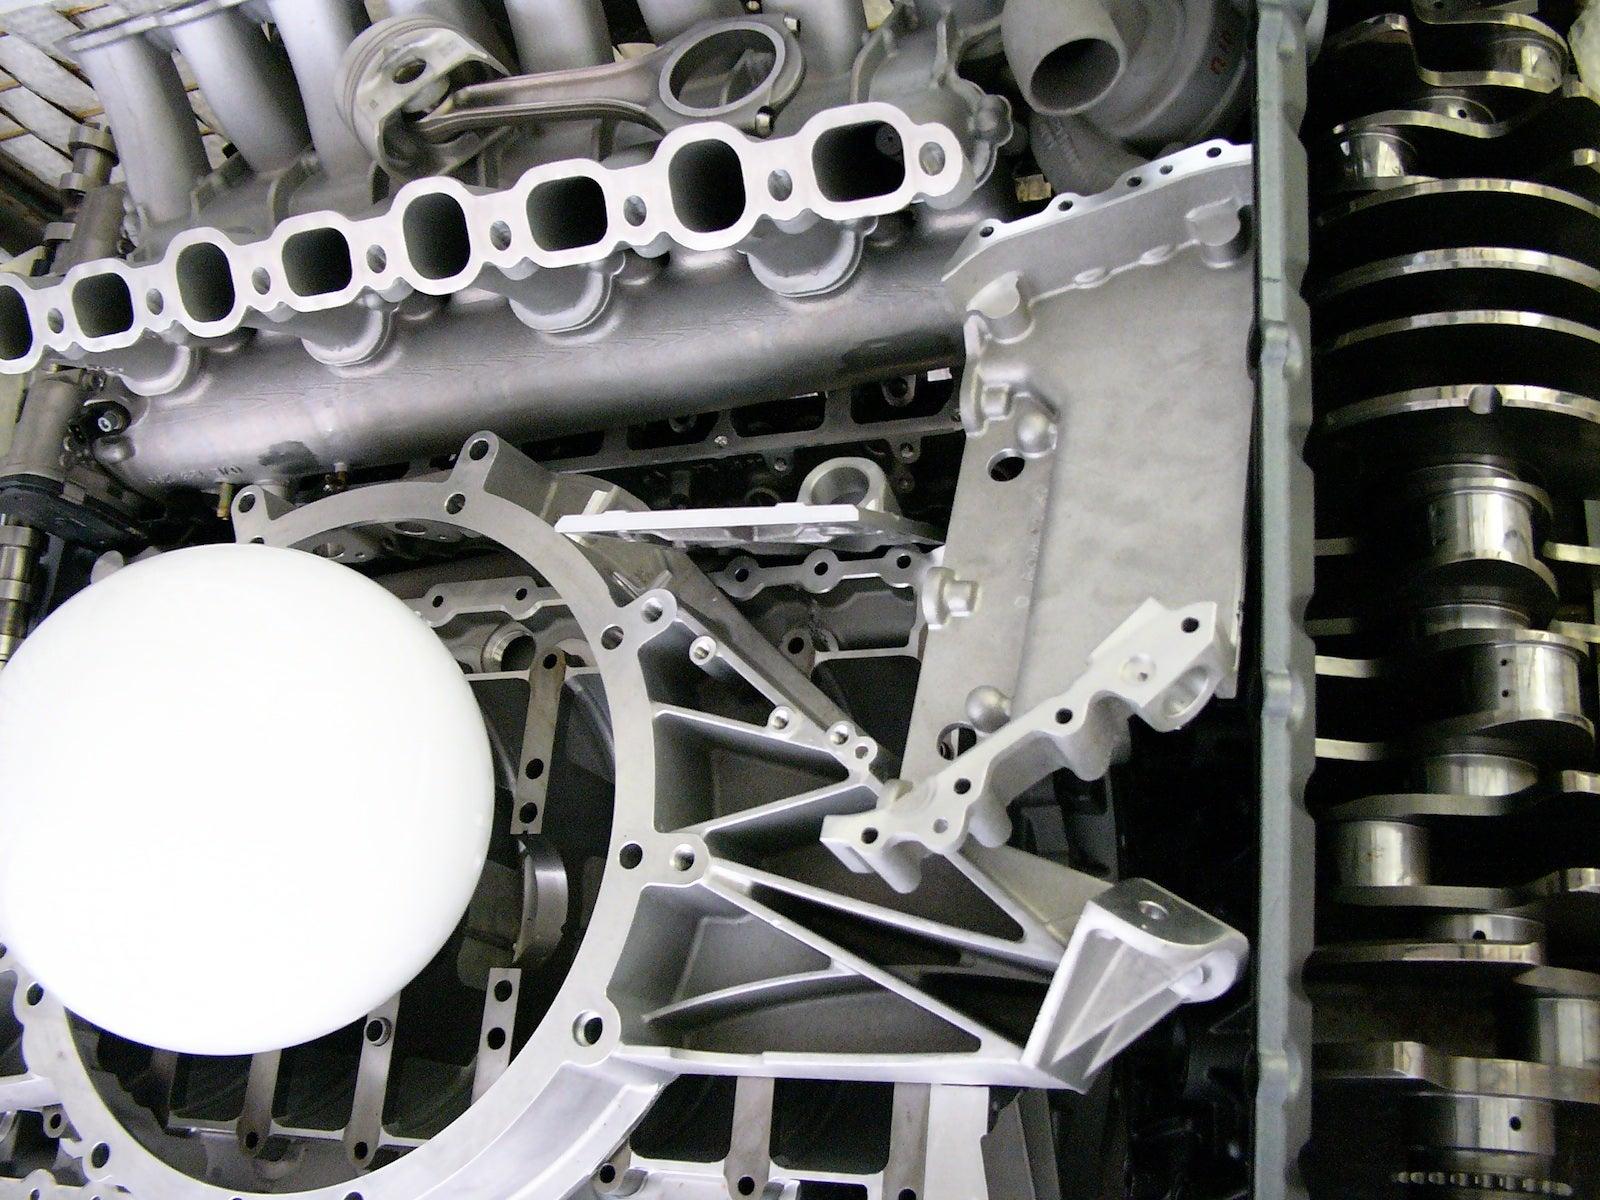 bugatti engine diagram wiring librarybugatti engine diagram